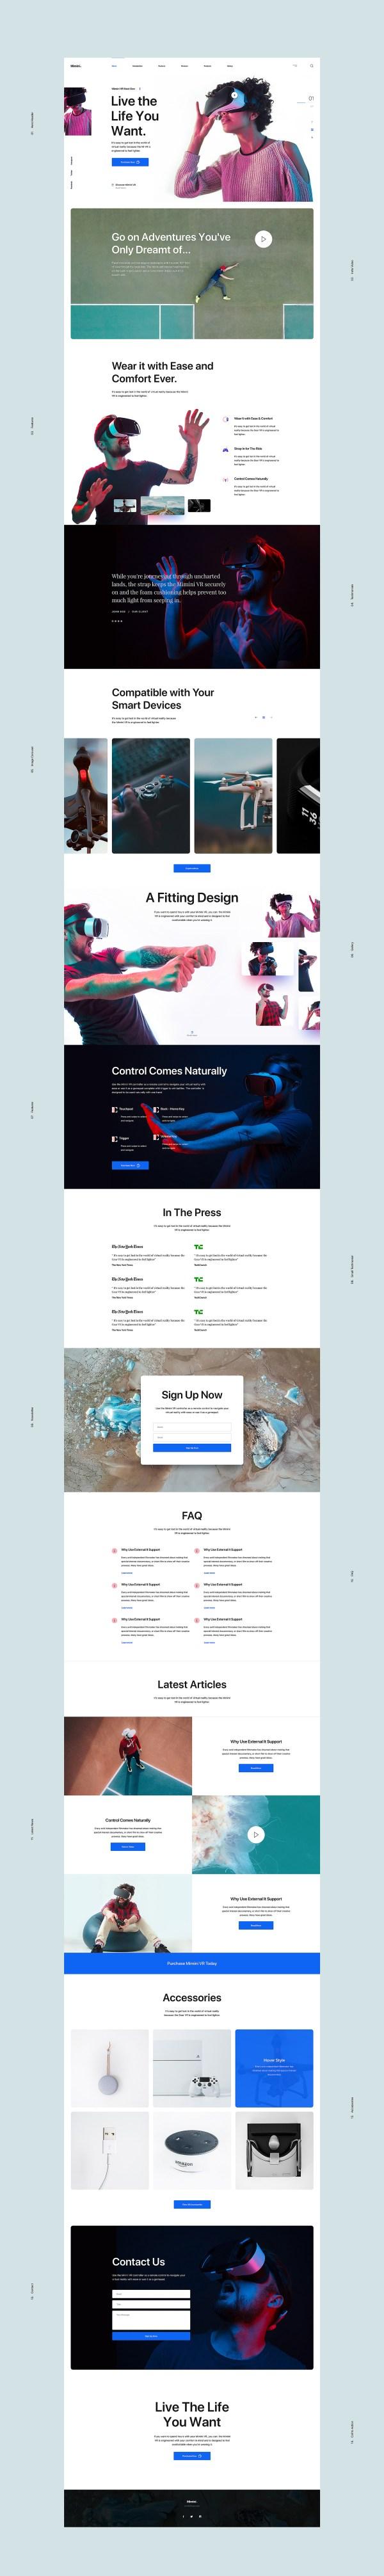 Mimini - Free Landing Page Sketch Template 02